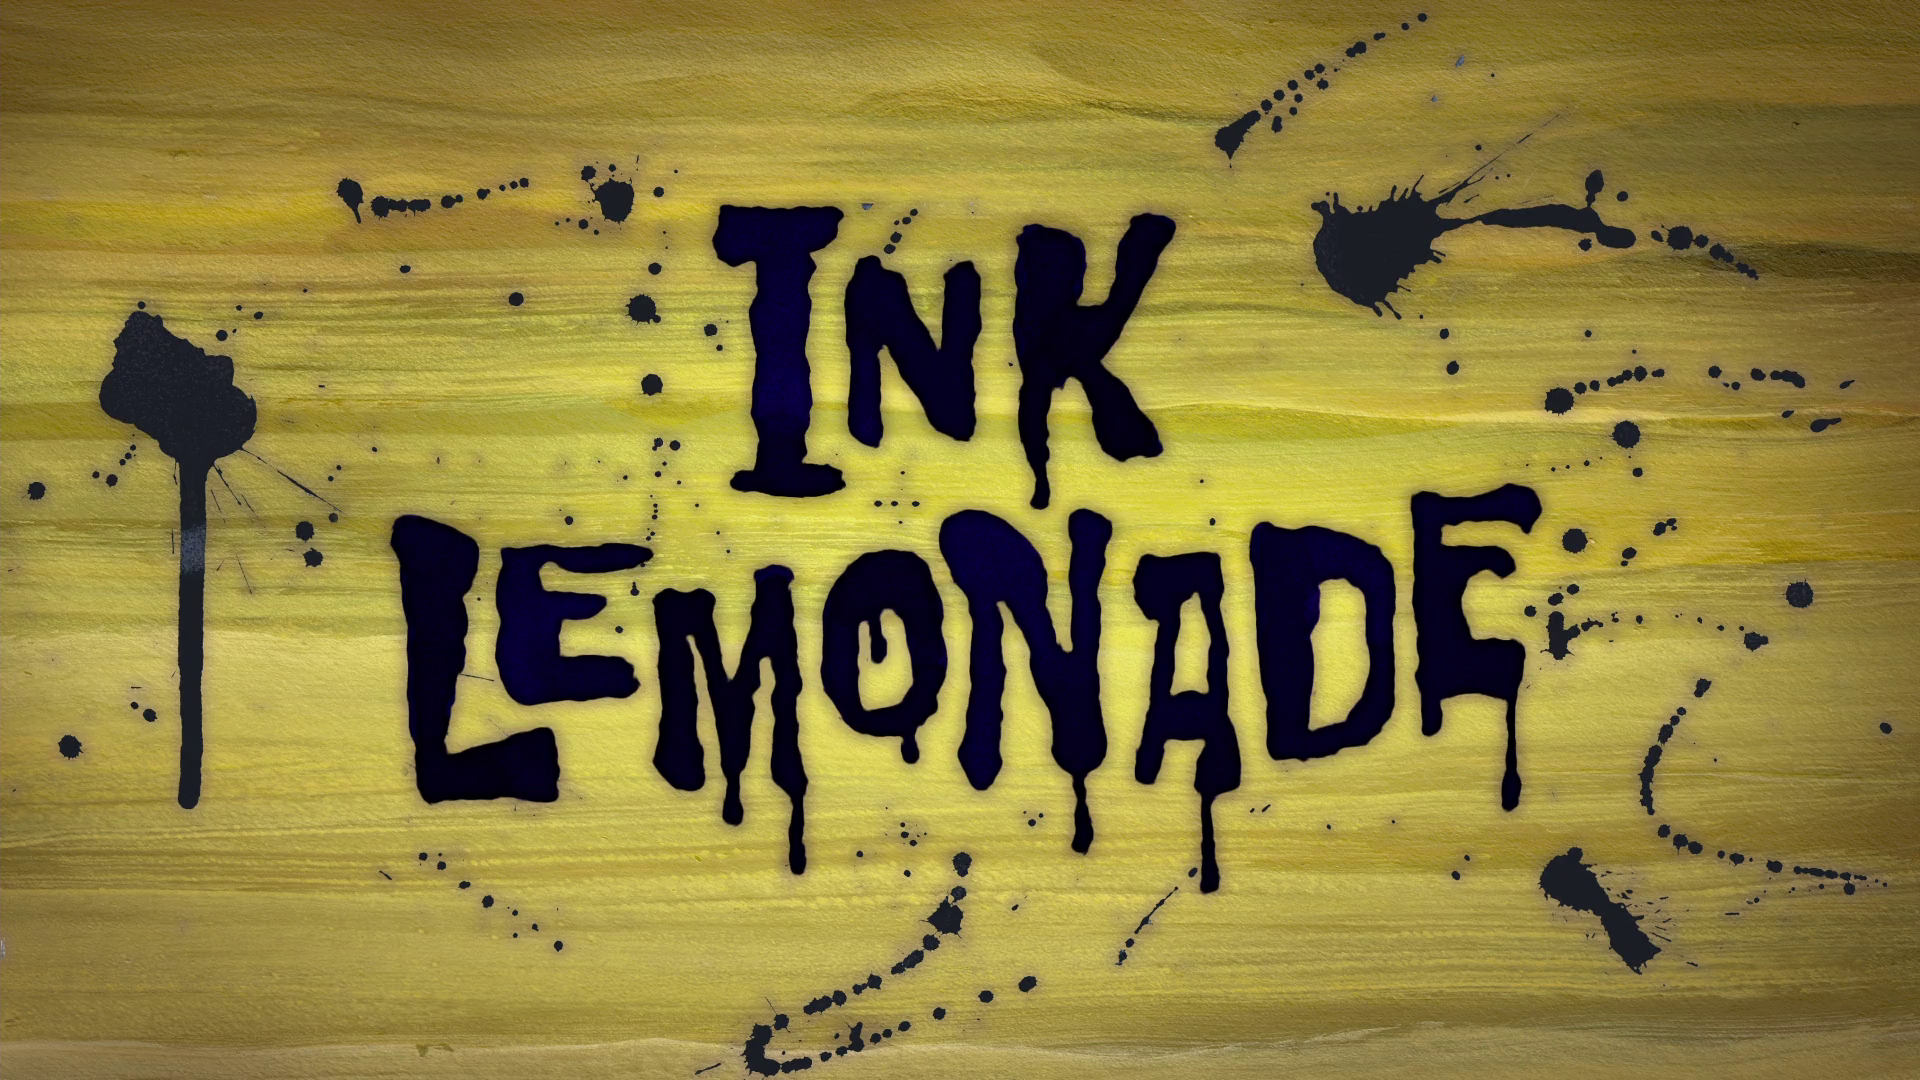 Ink Lemonade/transcript